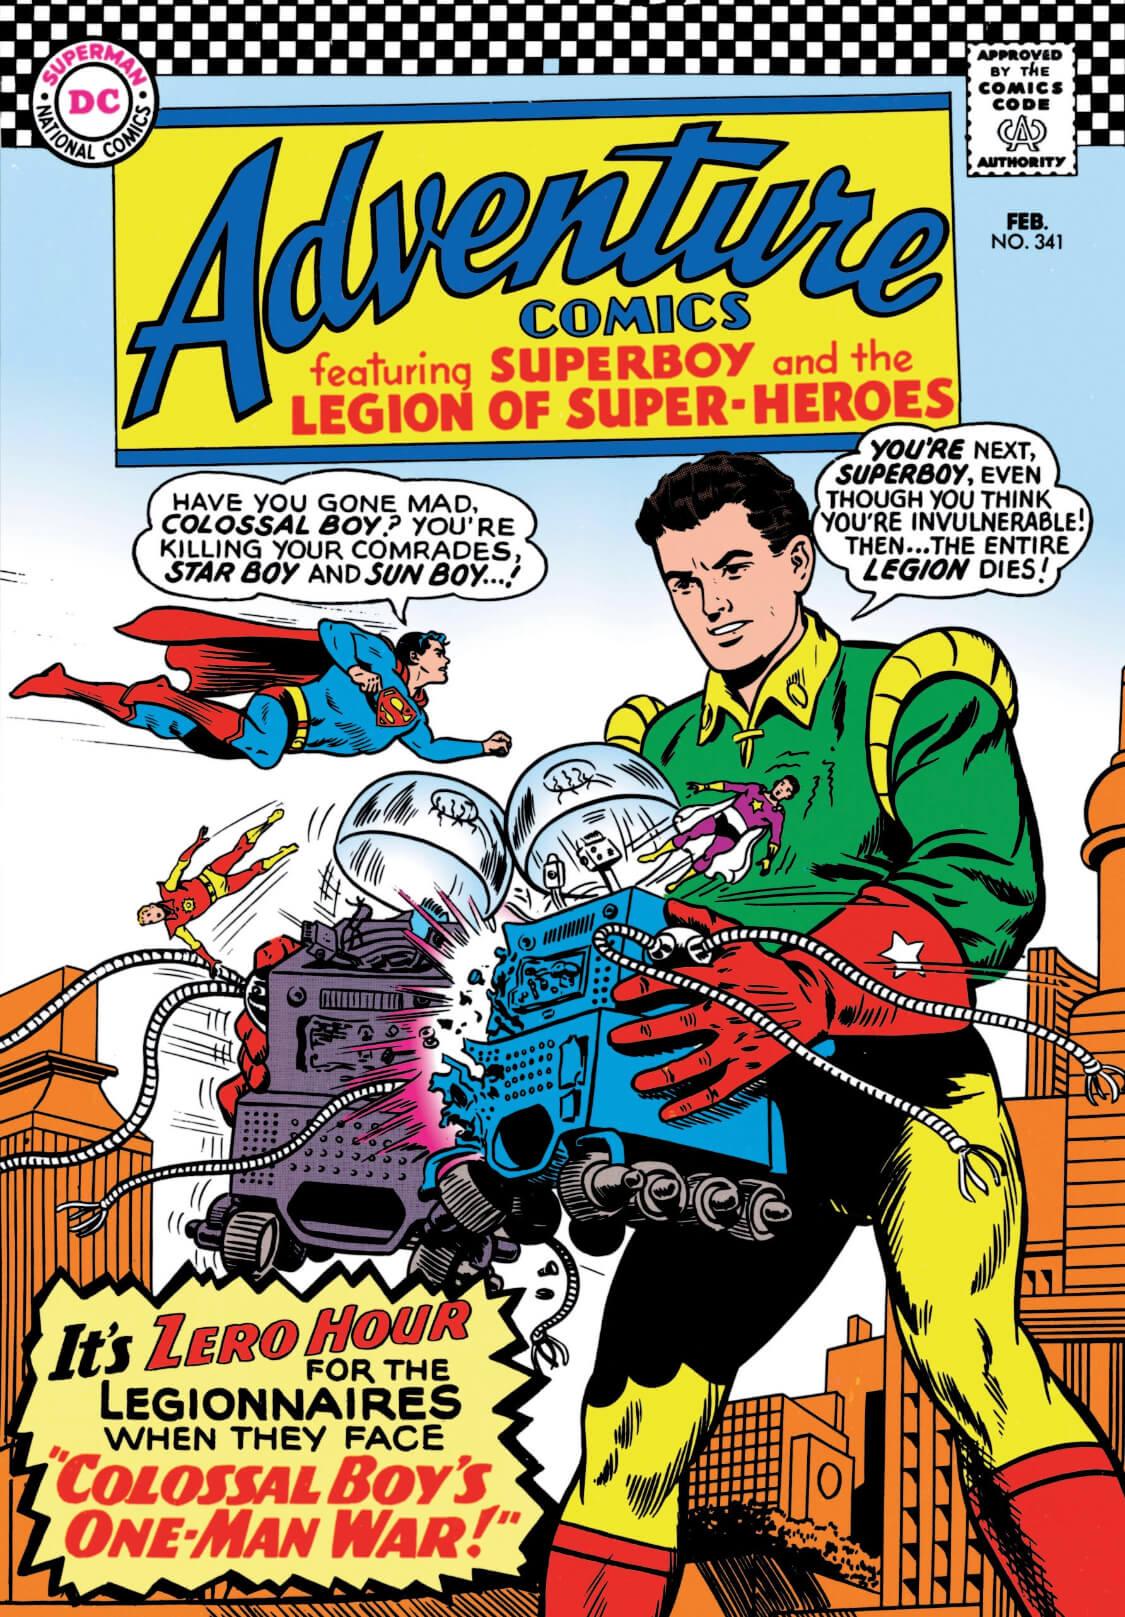 legion-of-super-heroes-silver-age.jpg